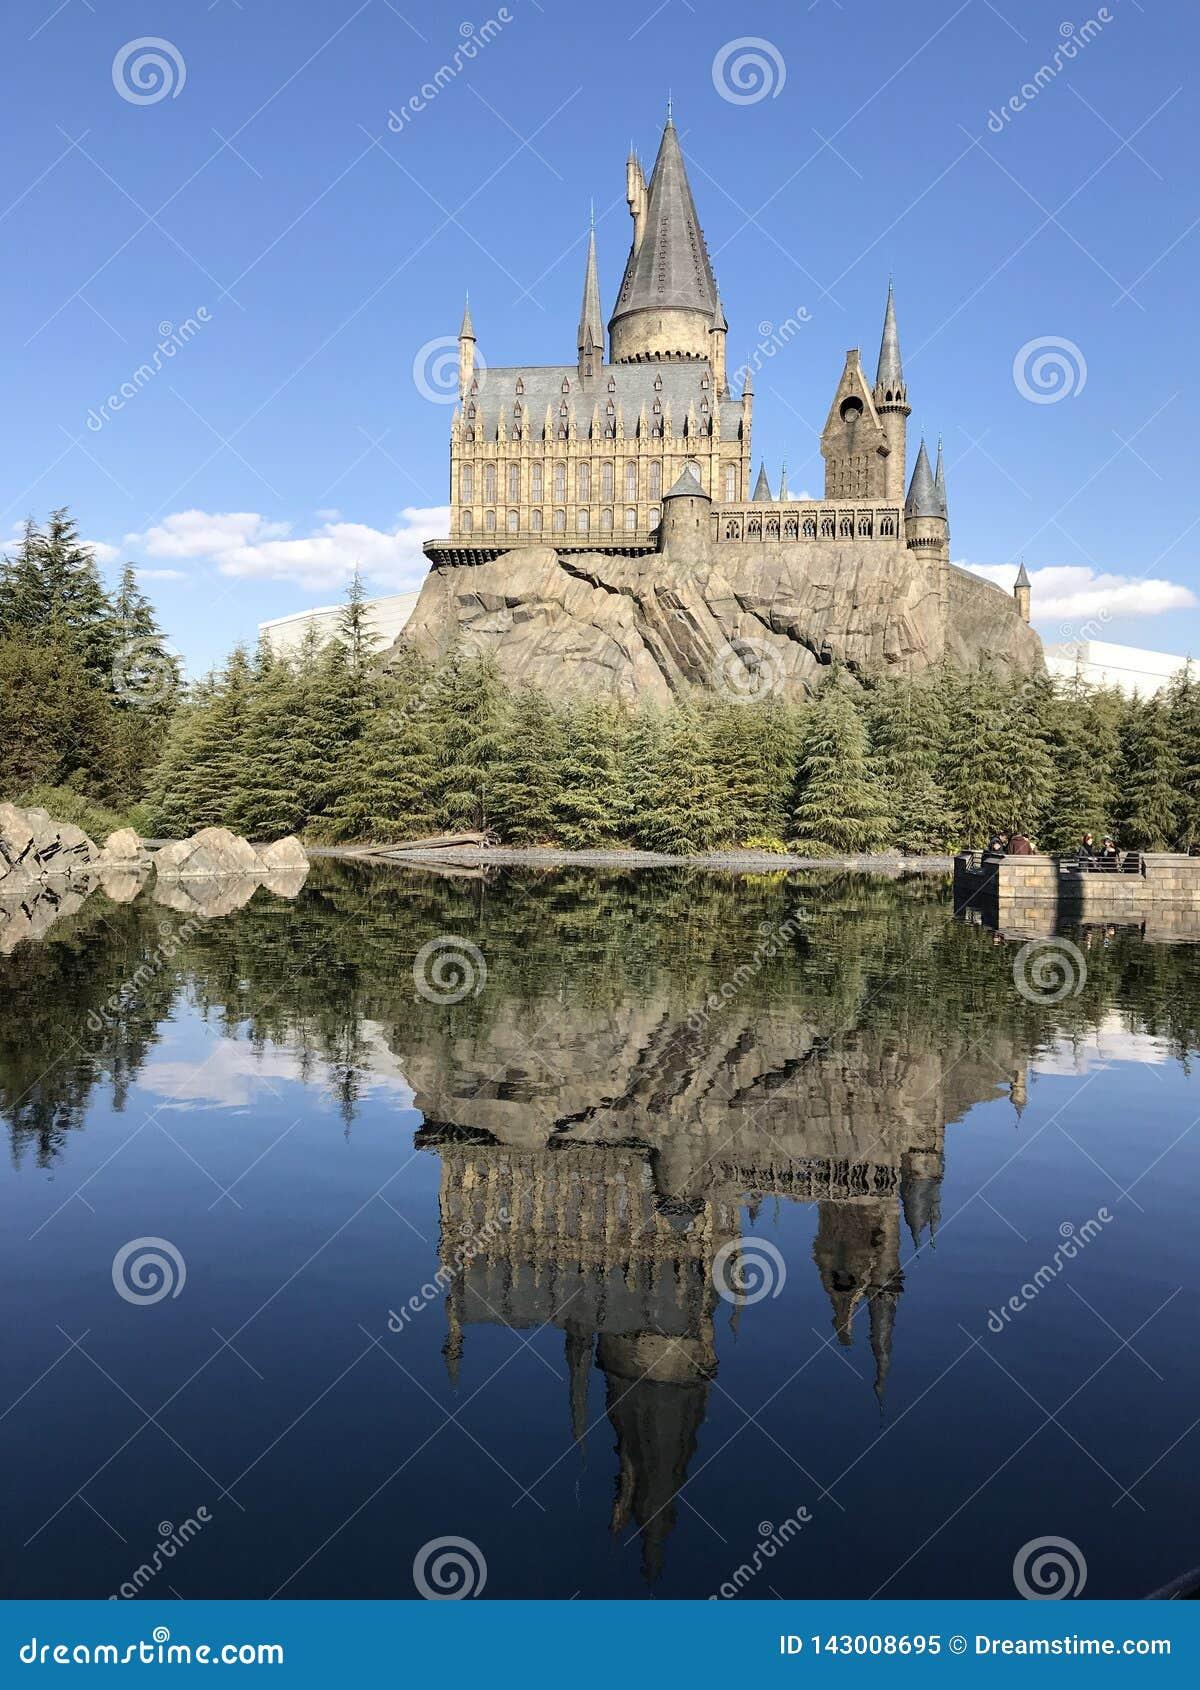 Castle : Harry Potter USJ